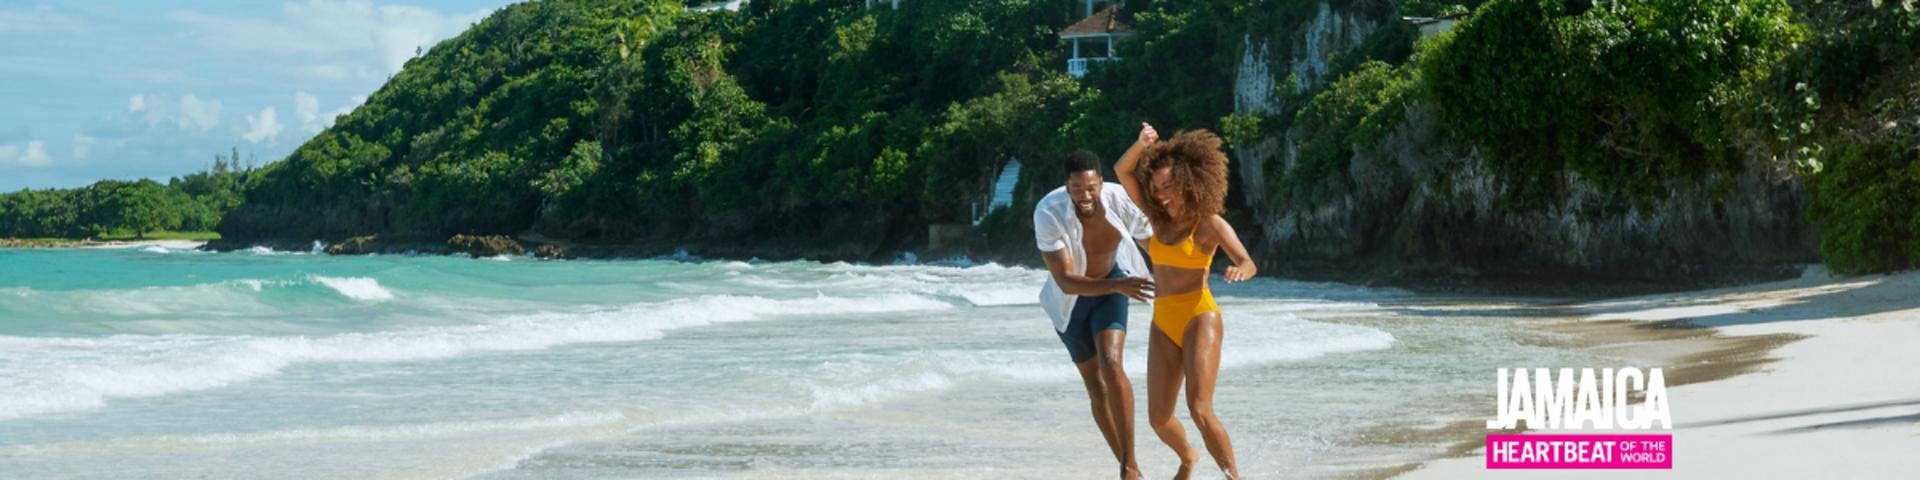 Entdecken Sie Jamaika